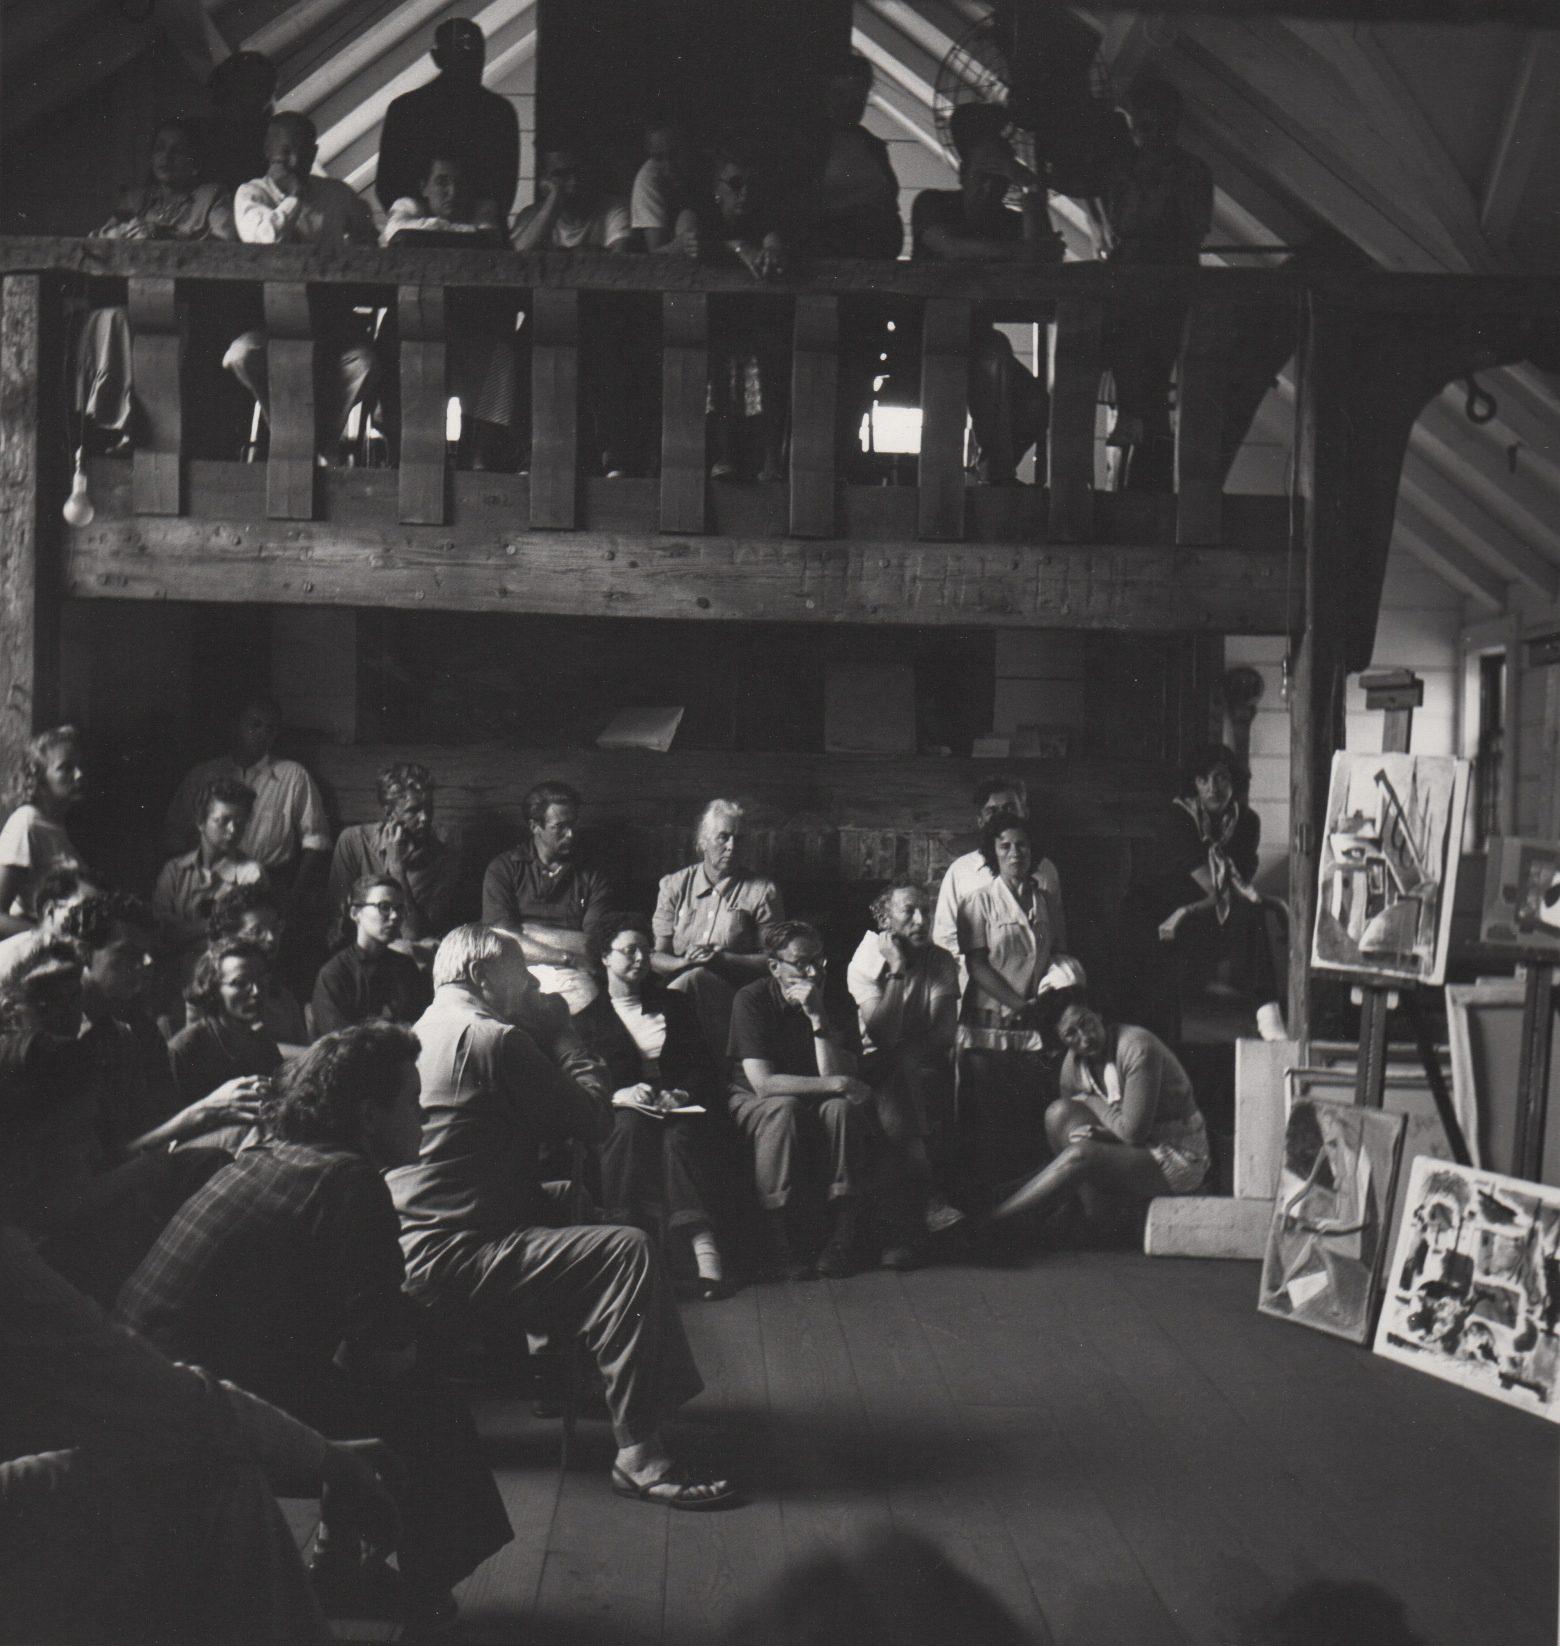 Hans Hofmann Friday Night Critique, 1948 - Provincetown, Ma. School (View #1)